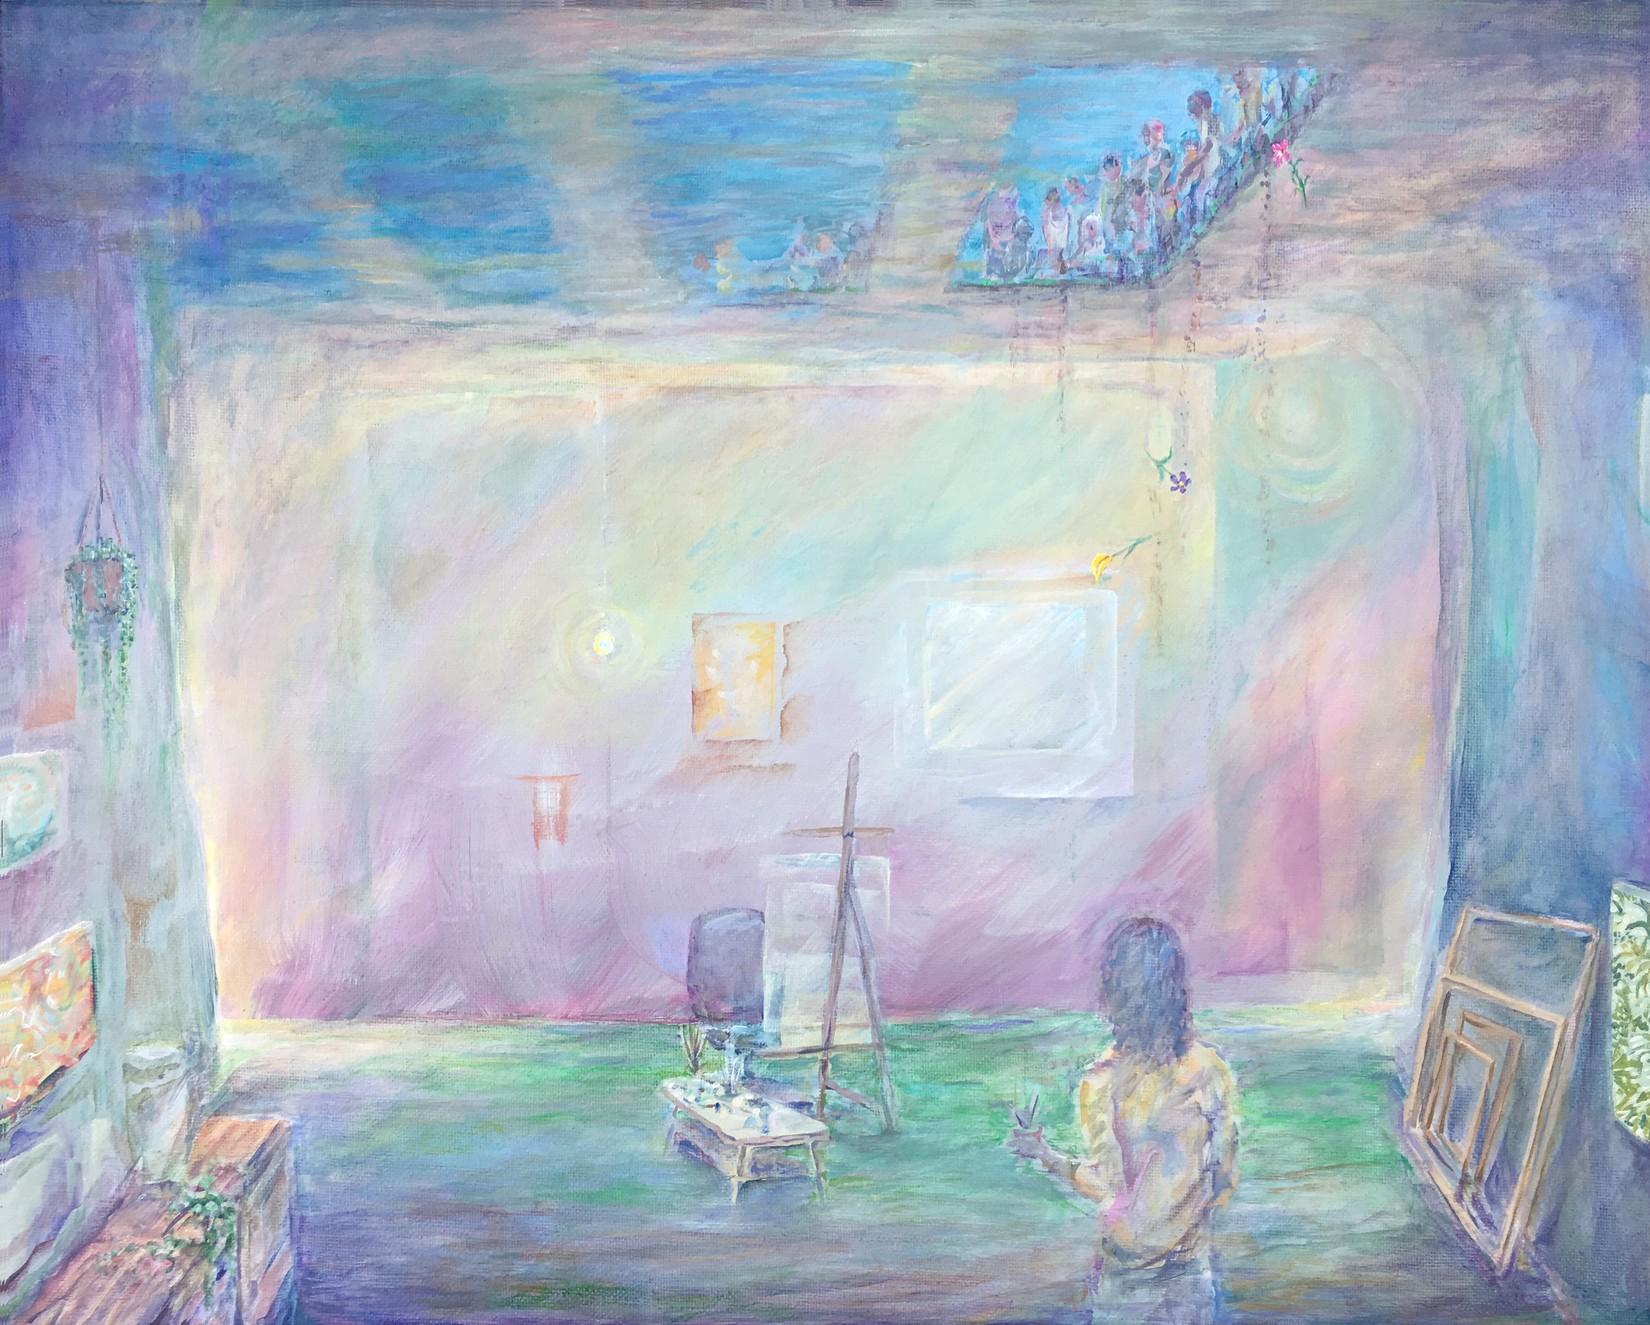 Studio Burial - acrylic on canvas, 16 x 20